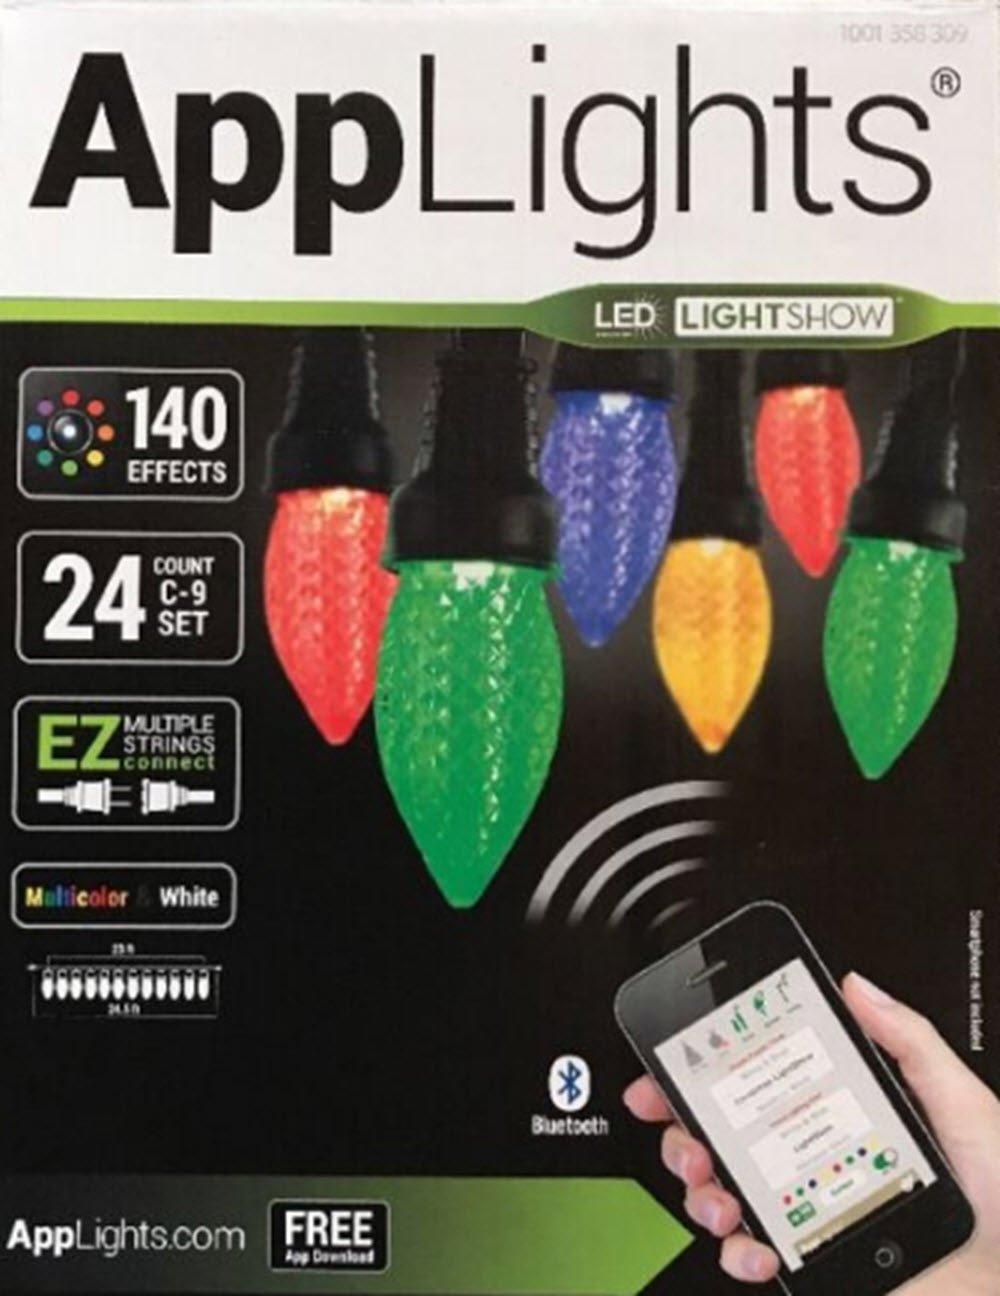 LightShow AppLights 24-Light LED C9 String Set Multicolor Bluetooth 140 Effects Color Changing